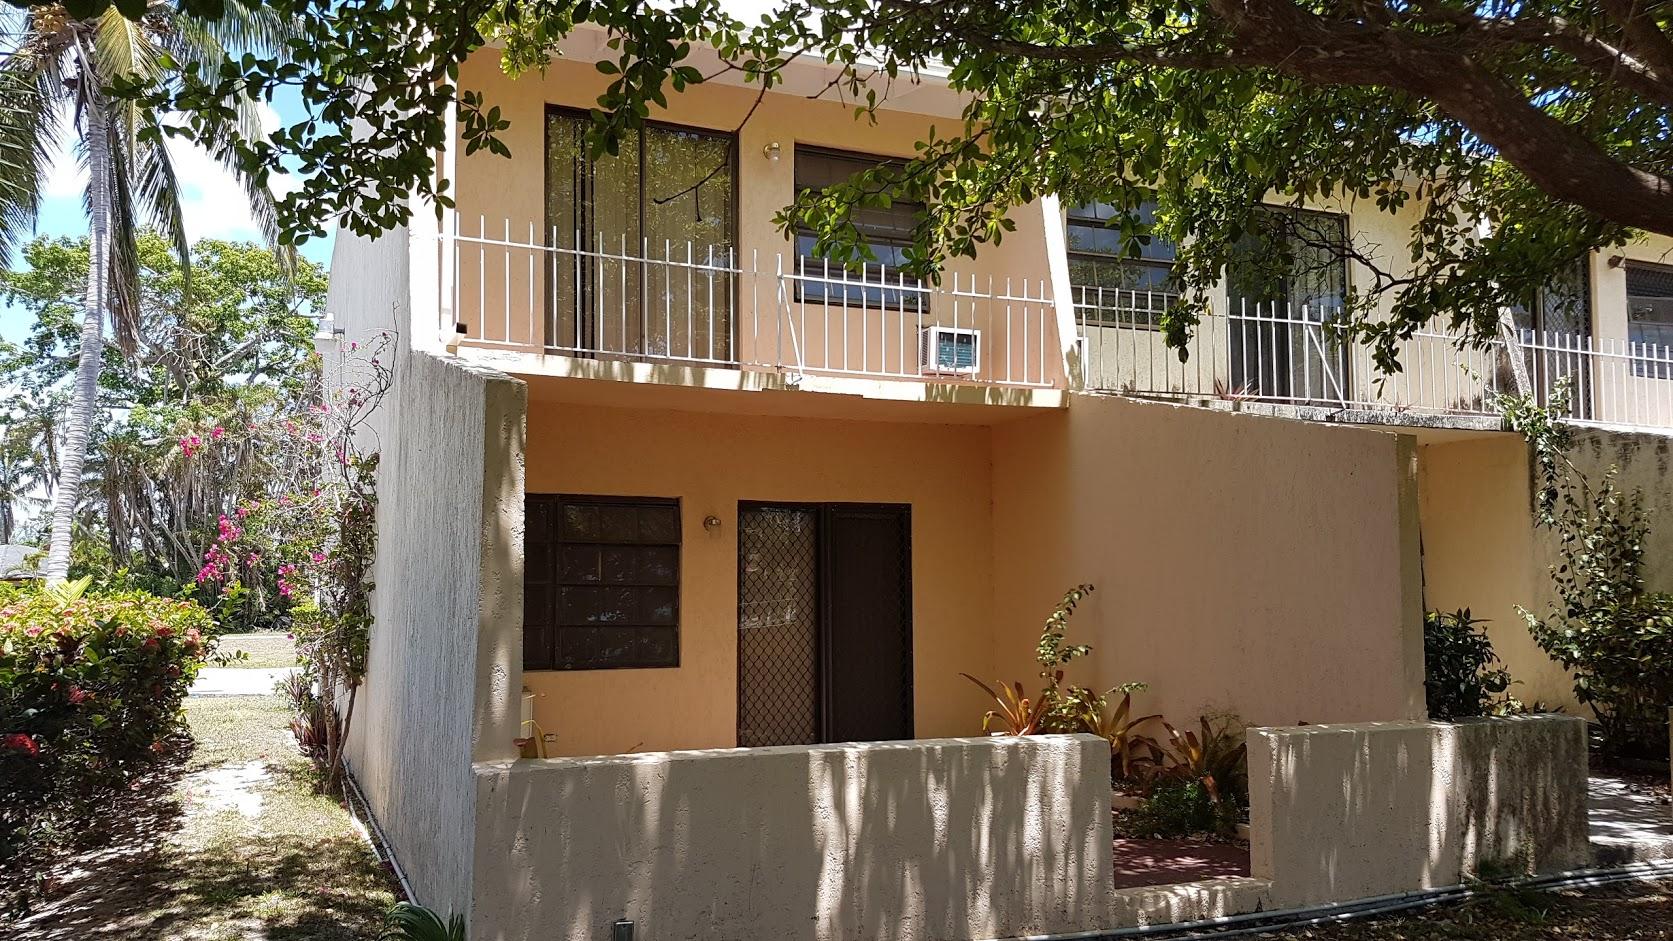 Co-op / Condo for Rent at #1 Neco Condominiums, Westward Villas Cable Beach, Nassau And Paradise Island, Bahamas